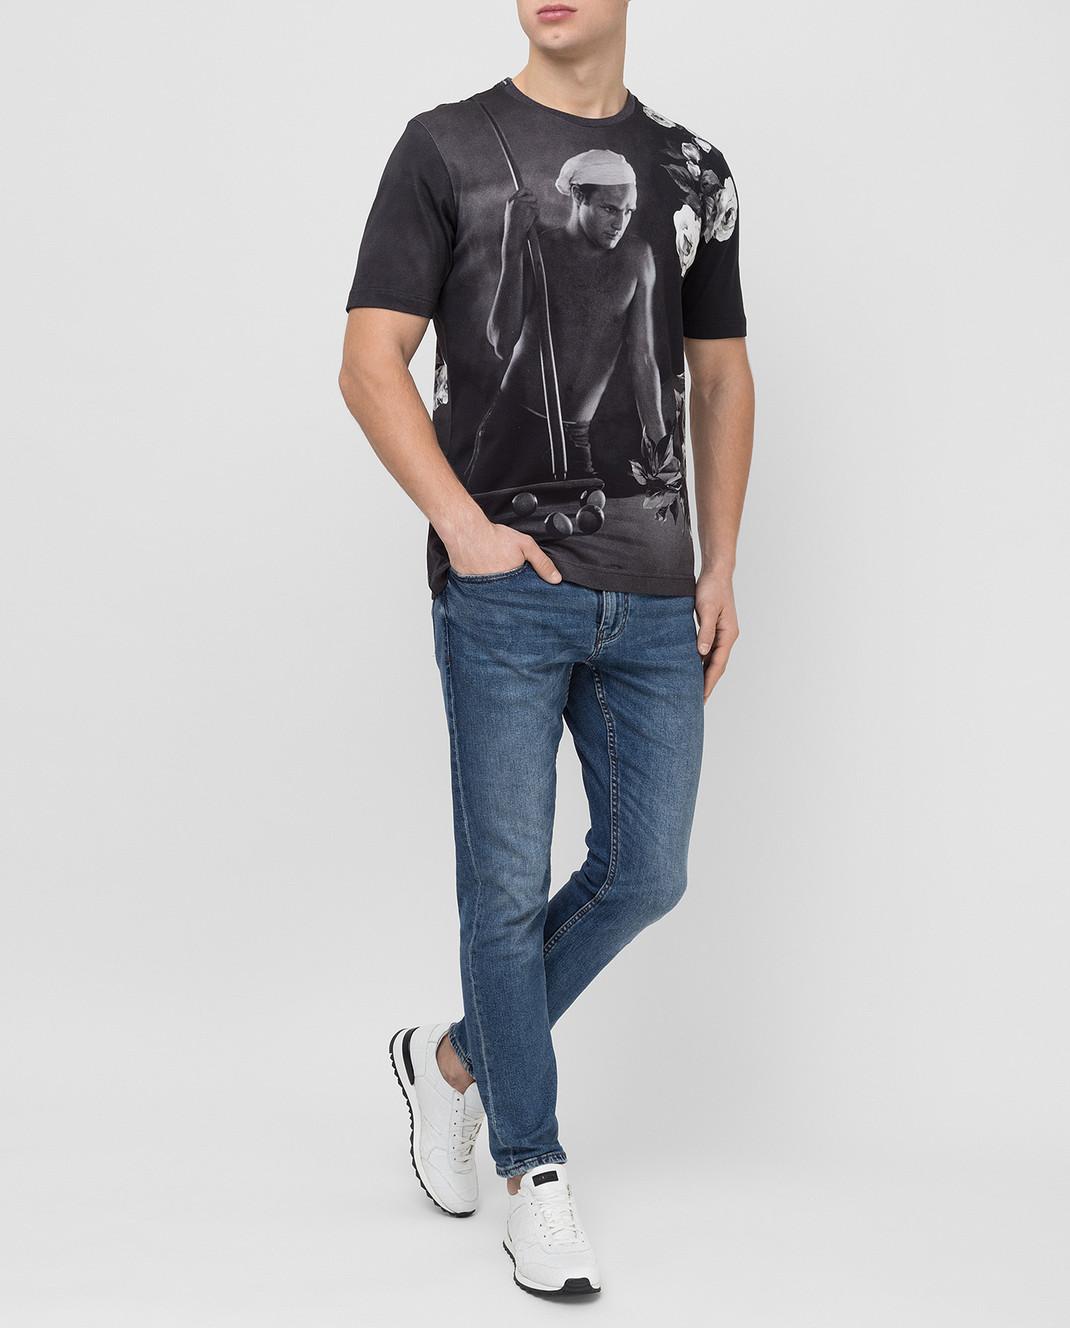 Dolce&Gabbana Черная футболка G8GW5TFP718 изображение 2